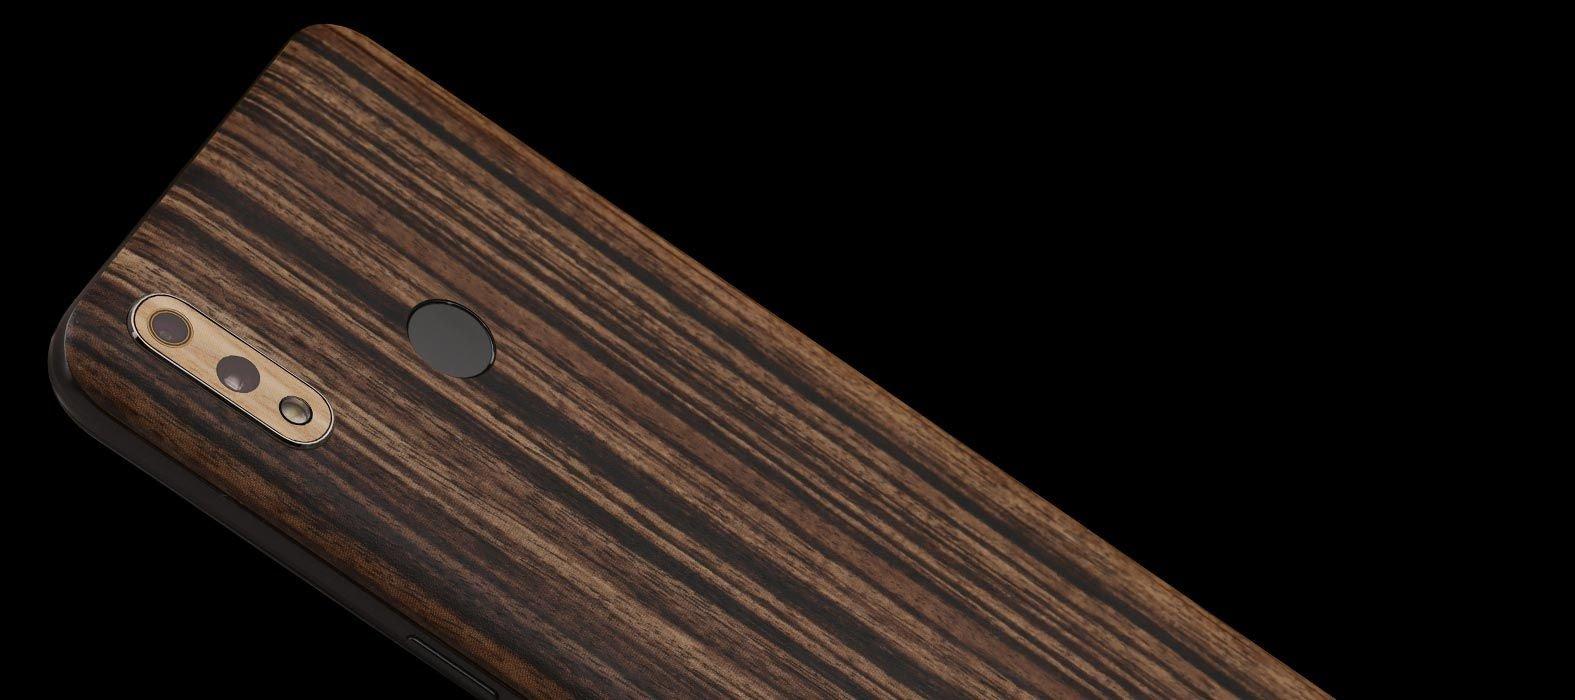 Realme-3-Pro_Zebra-Wood_Skins